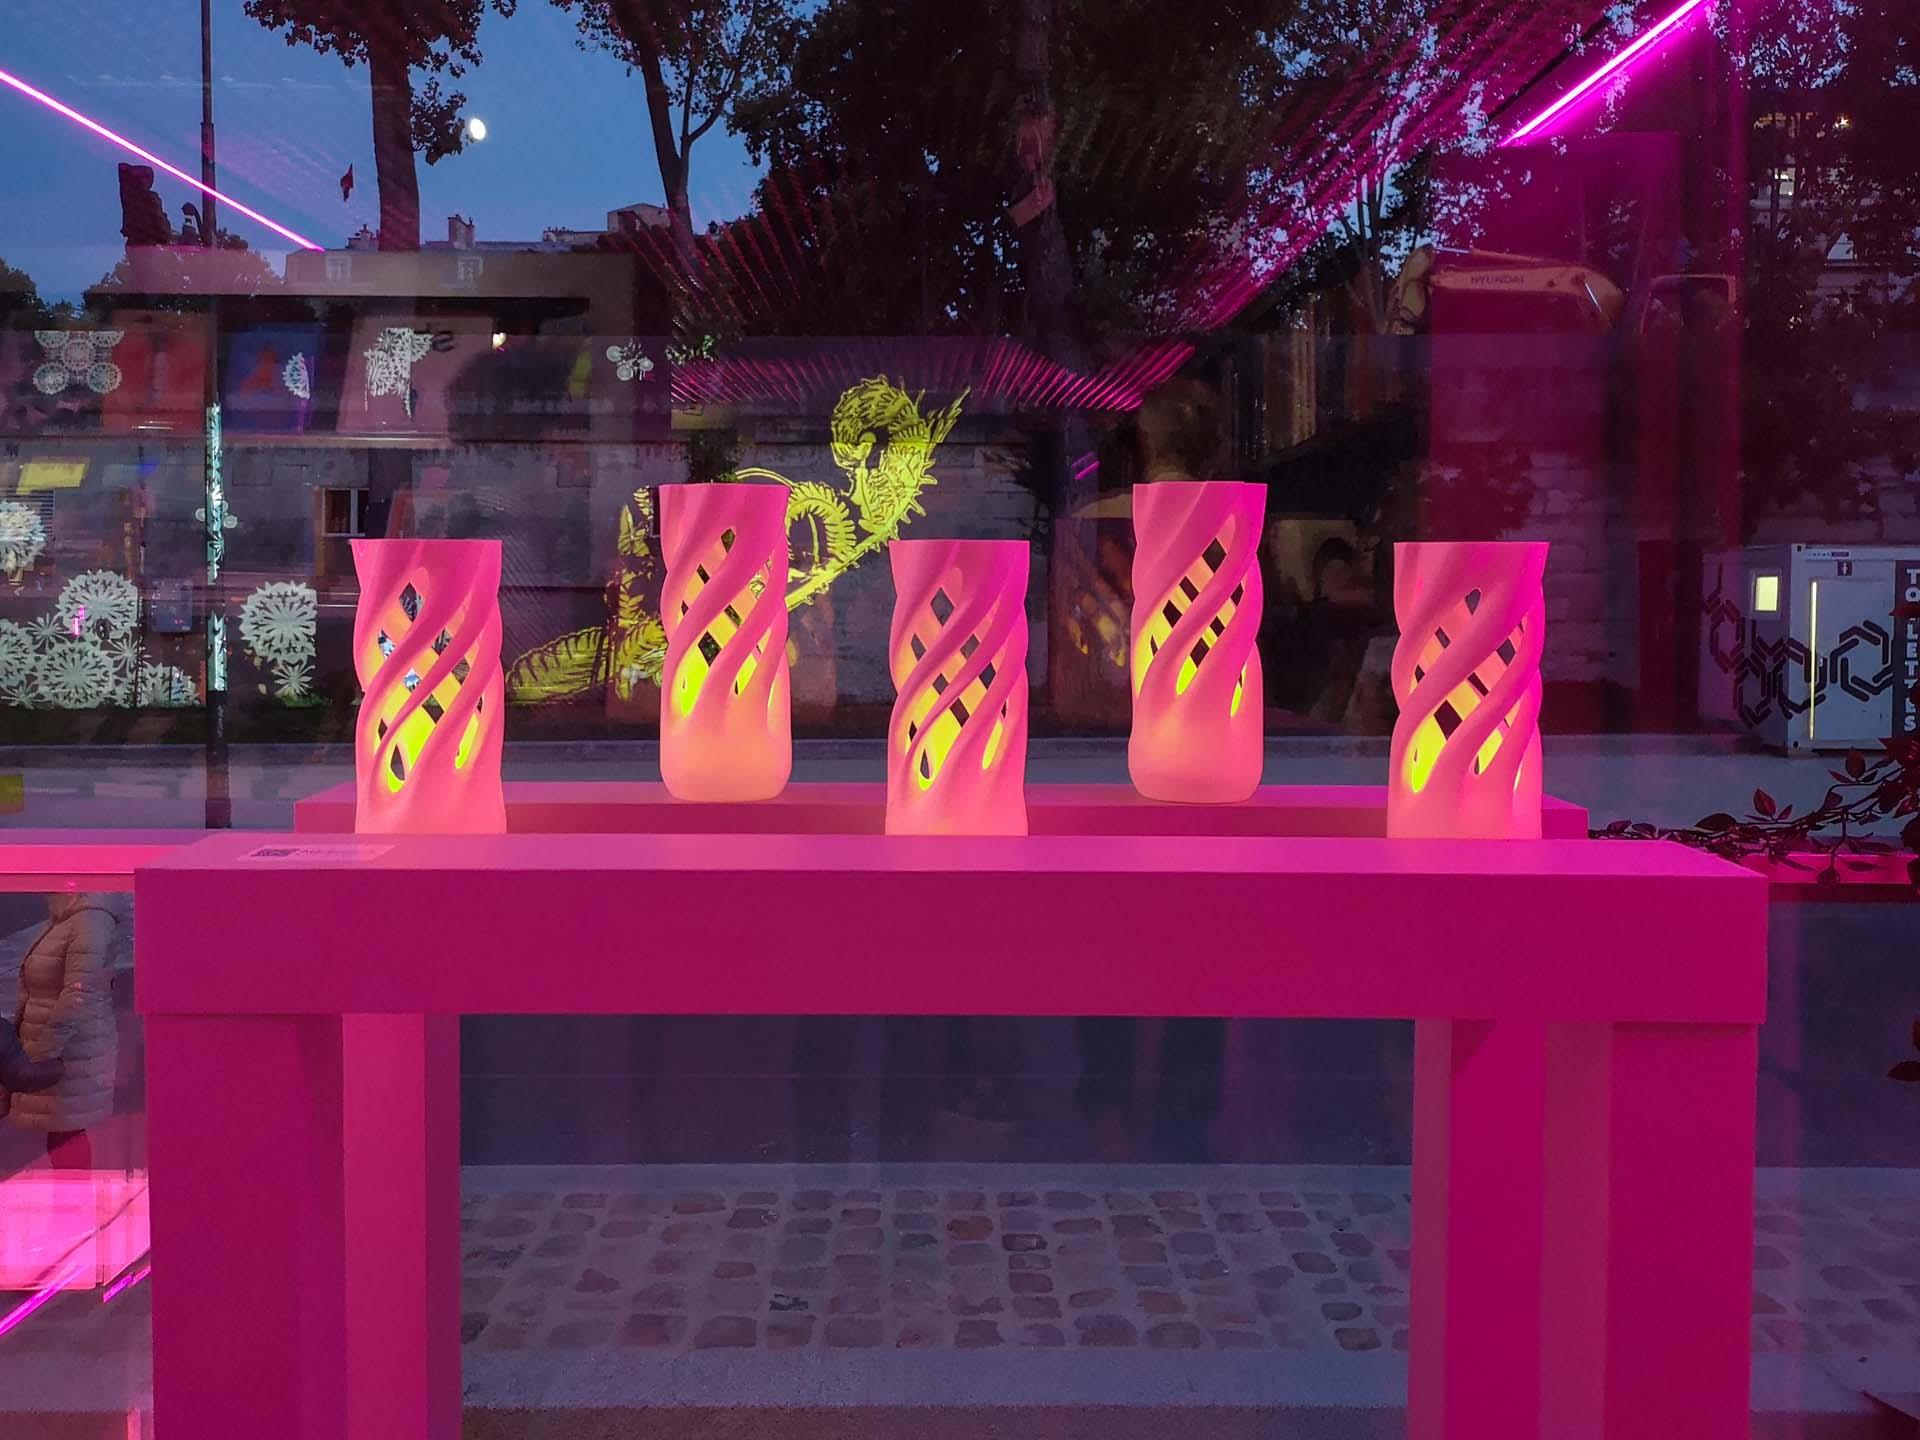 Abbracciame Candle for tealight by David Bitton & Adriano Alfaro @ Fluctuart - Le Grand Jeu